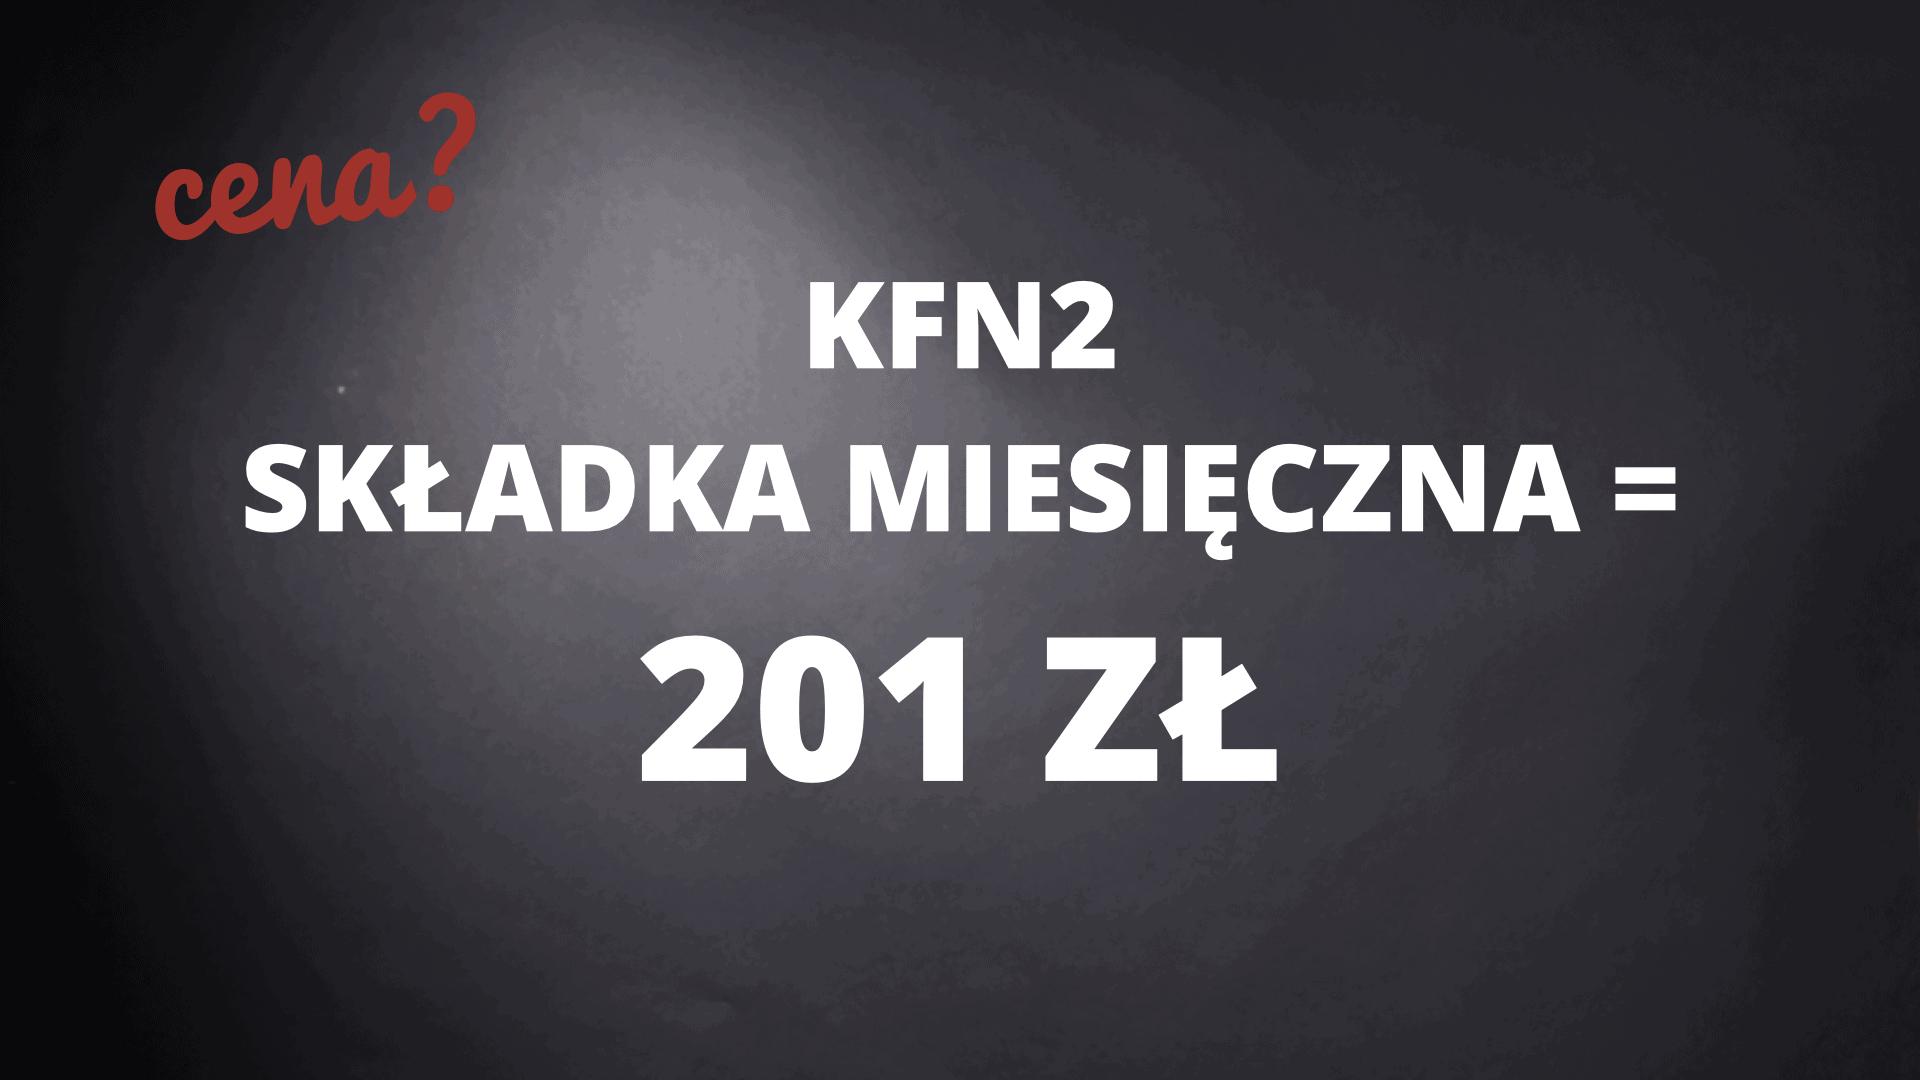 KFN2 składka miesięczna